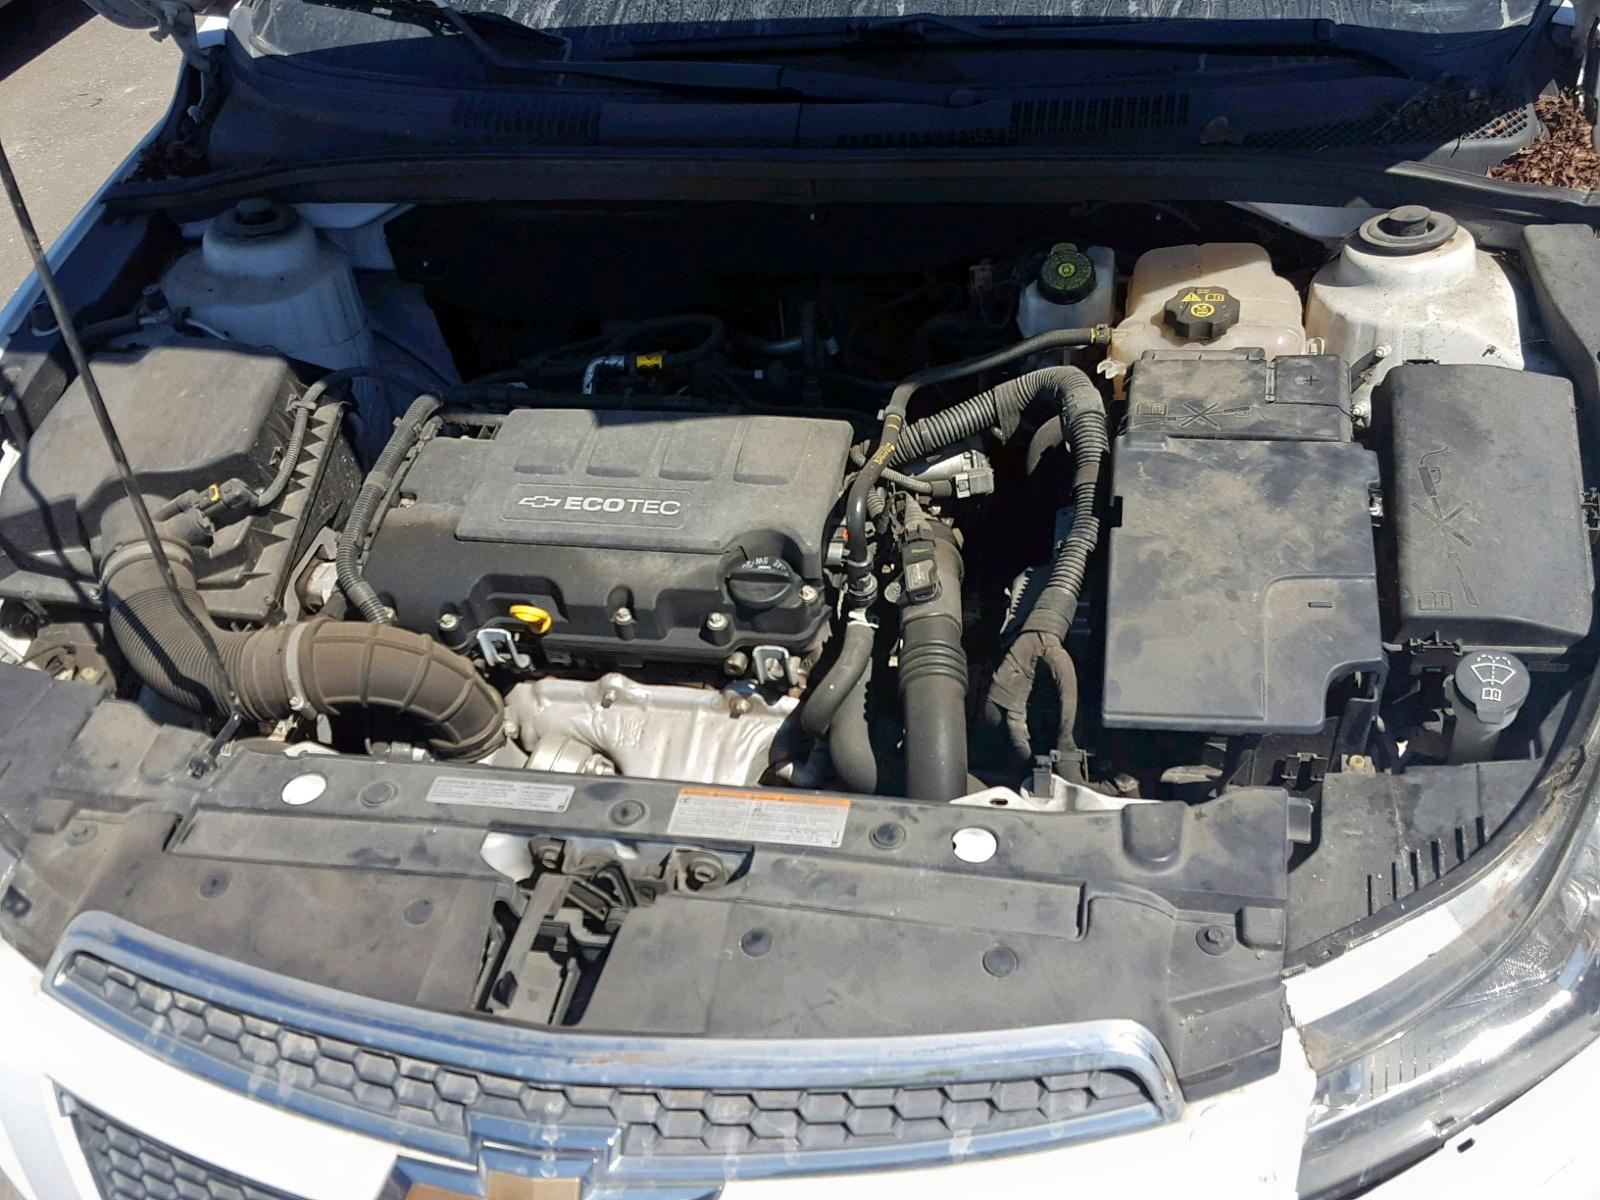 1G1PF5S9XB7293821 - 2011 Chevrolet Cruze Lt 1.4L inside view